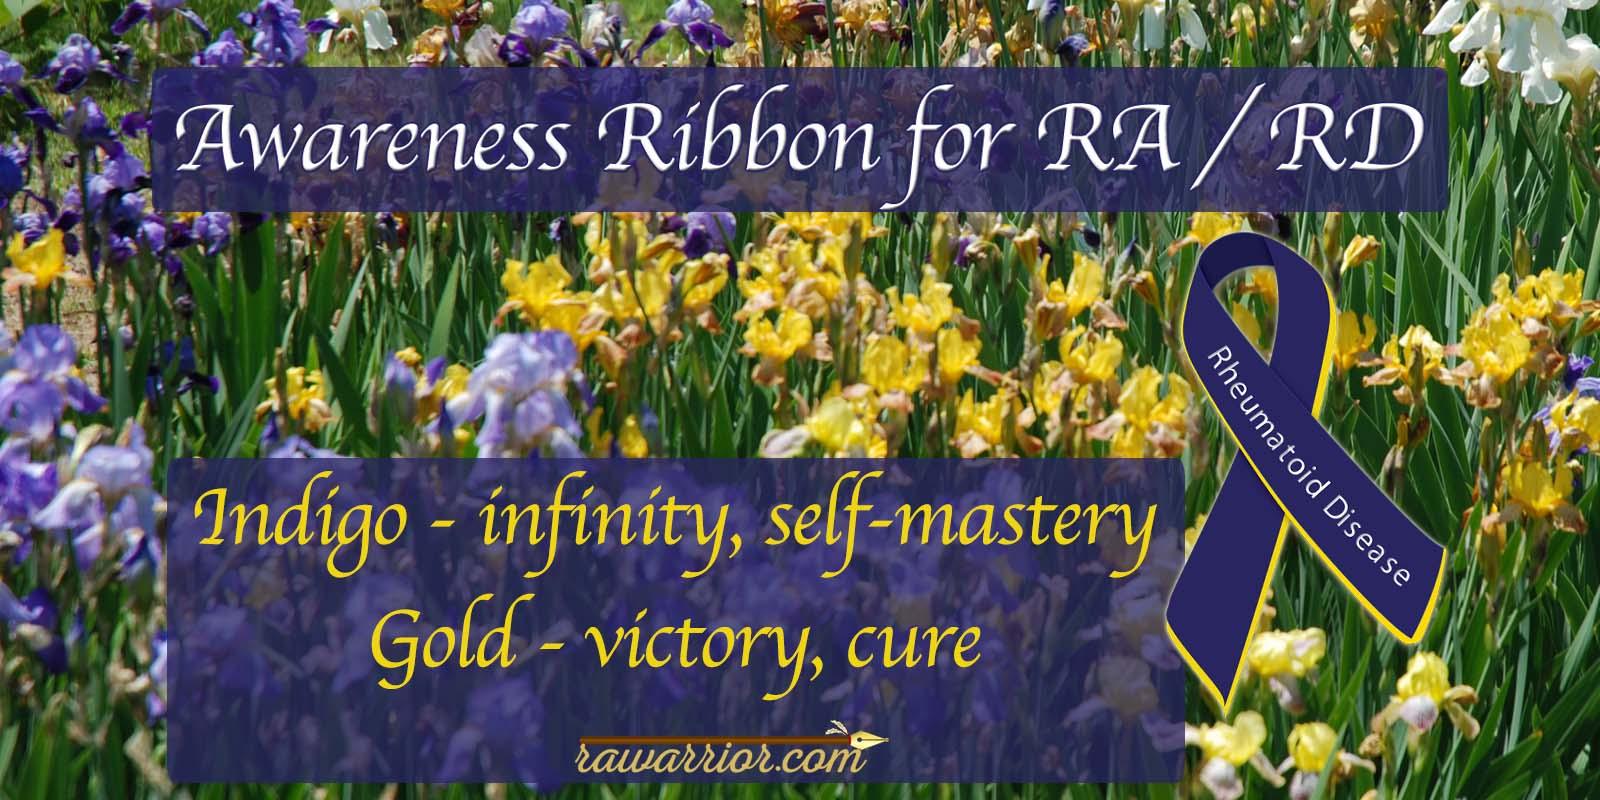 Awareness Ribbon for Rheumatoid Arthritis